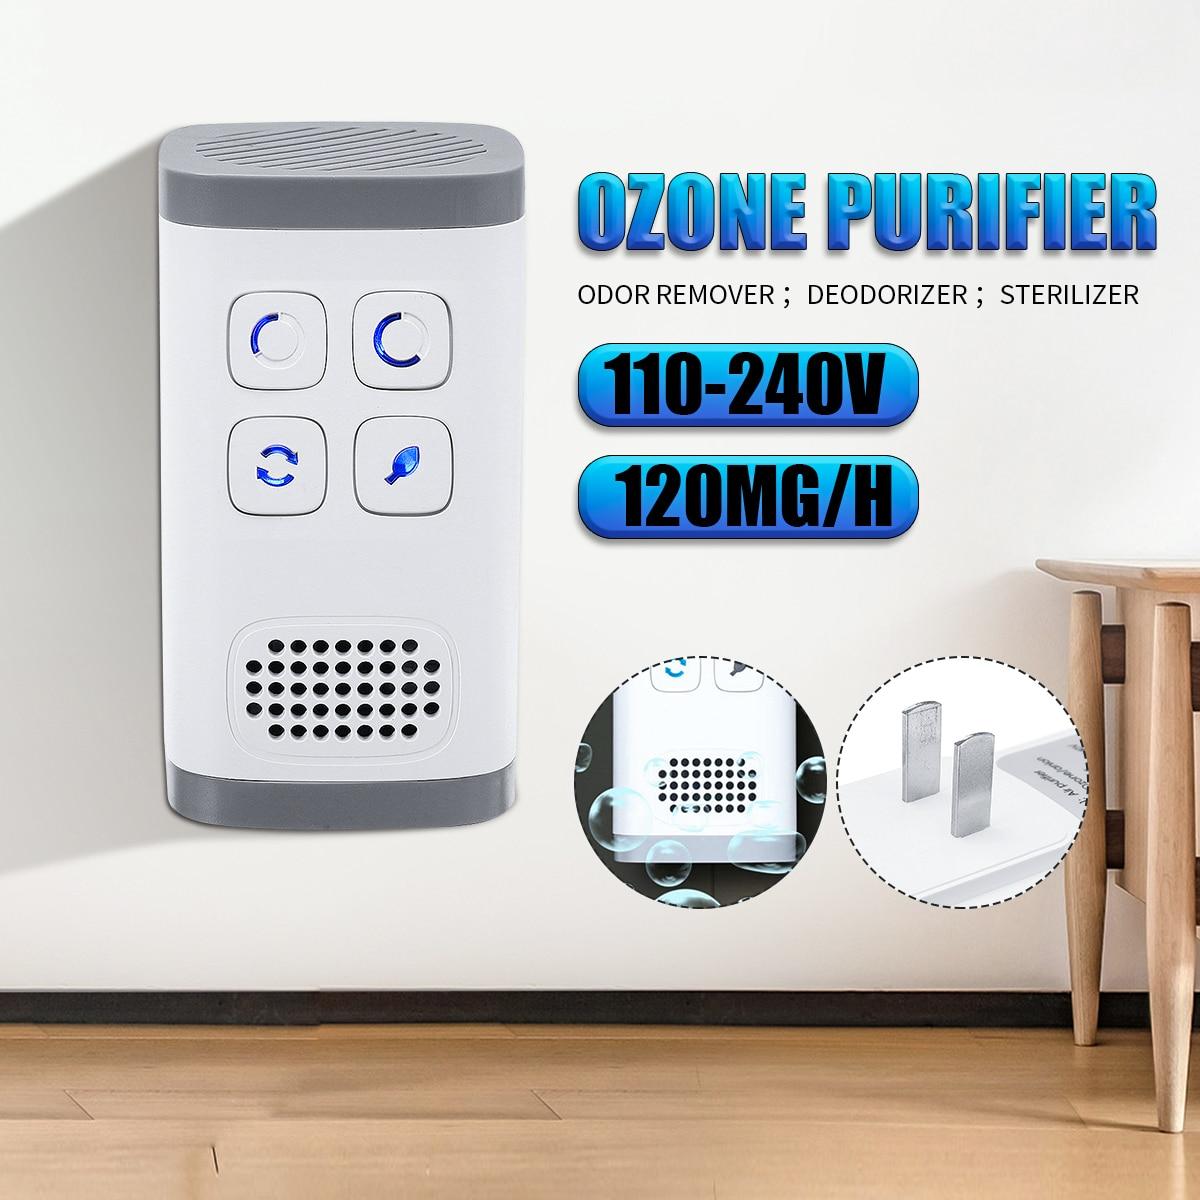 Air-Purifier Ionizer Generator Ozone Generator FILTER Purification  Home Toilet Deodorizer Pet Deodorizer Air Ionizer AC110-240v